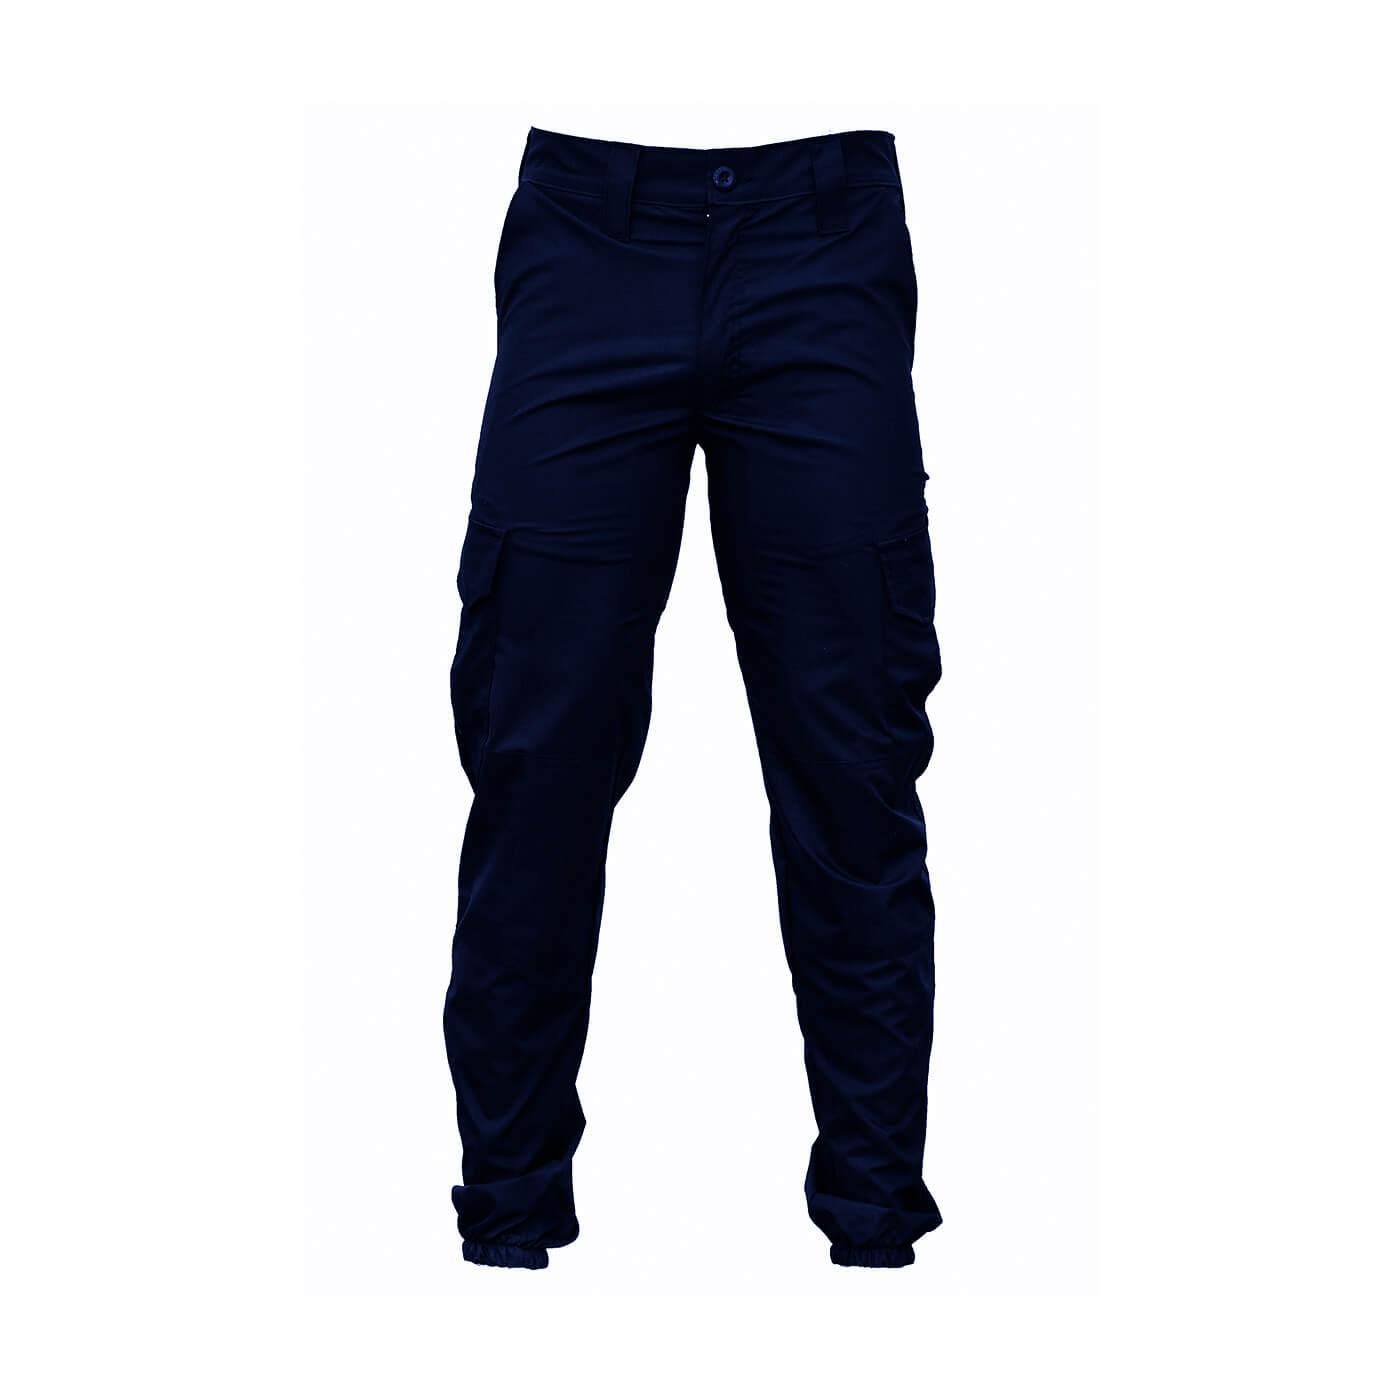 Pantalon-Ultra-azul_0000s_0006_Pantalon-Ultra-3